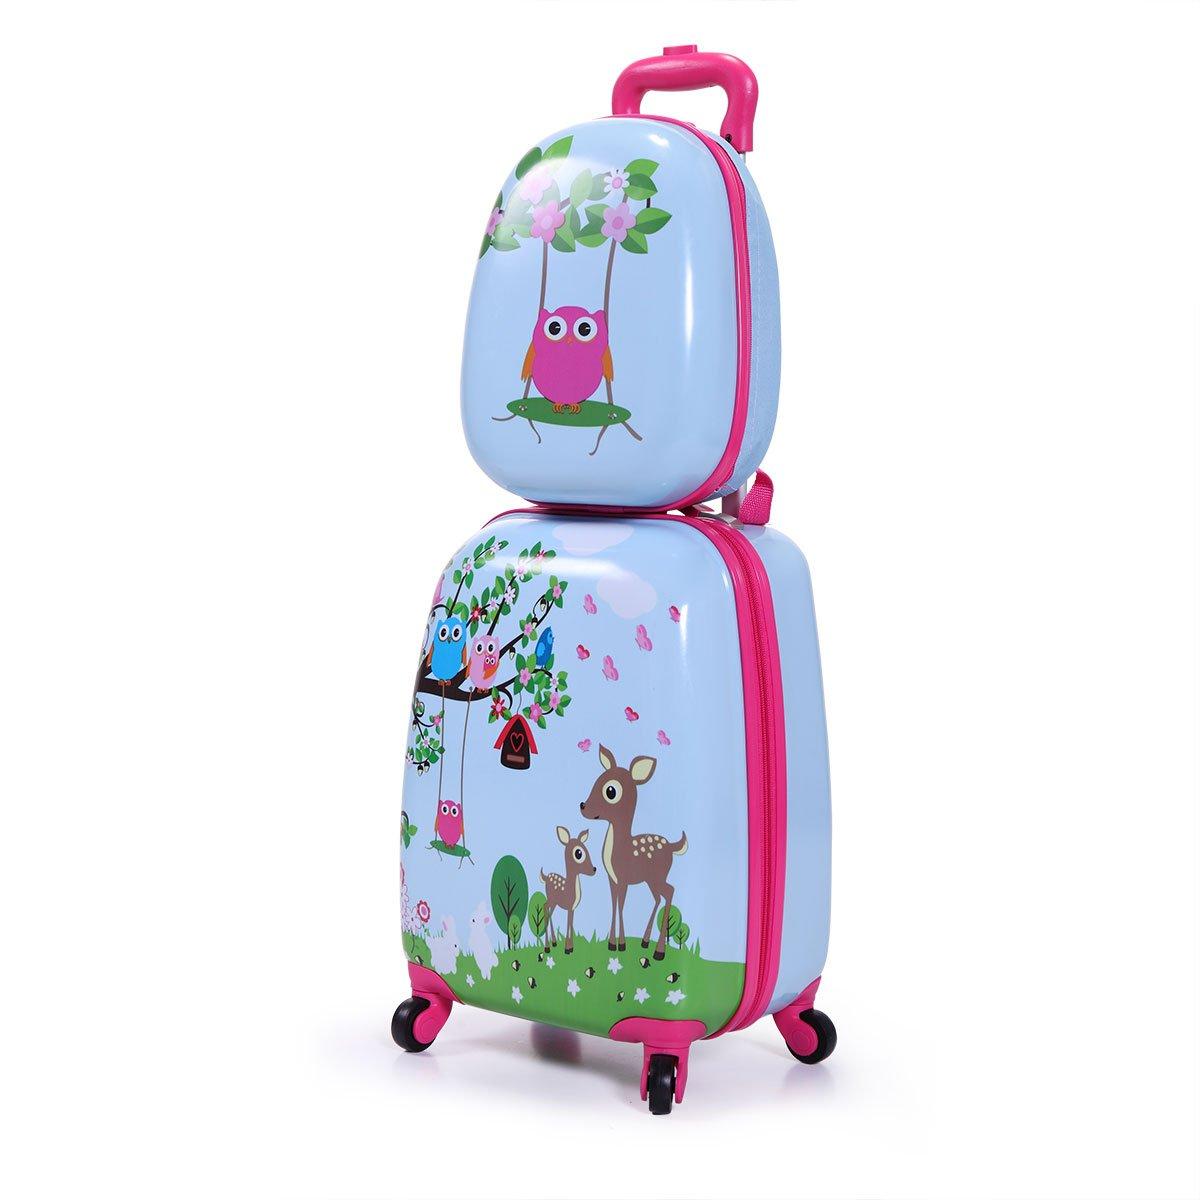 JAXPETY Kids Carry On Luggage Set 2Pc 12'' 16''Upright Hard Side Hard Shell Suitcase (Style-1)